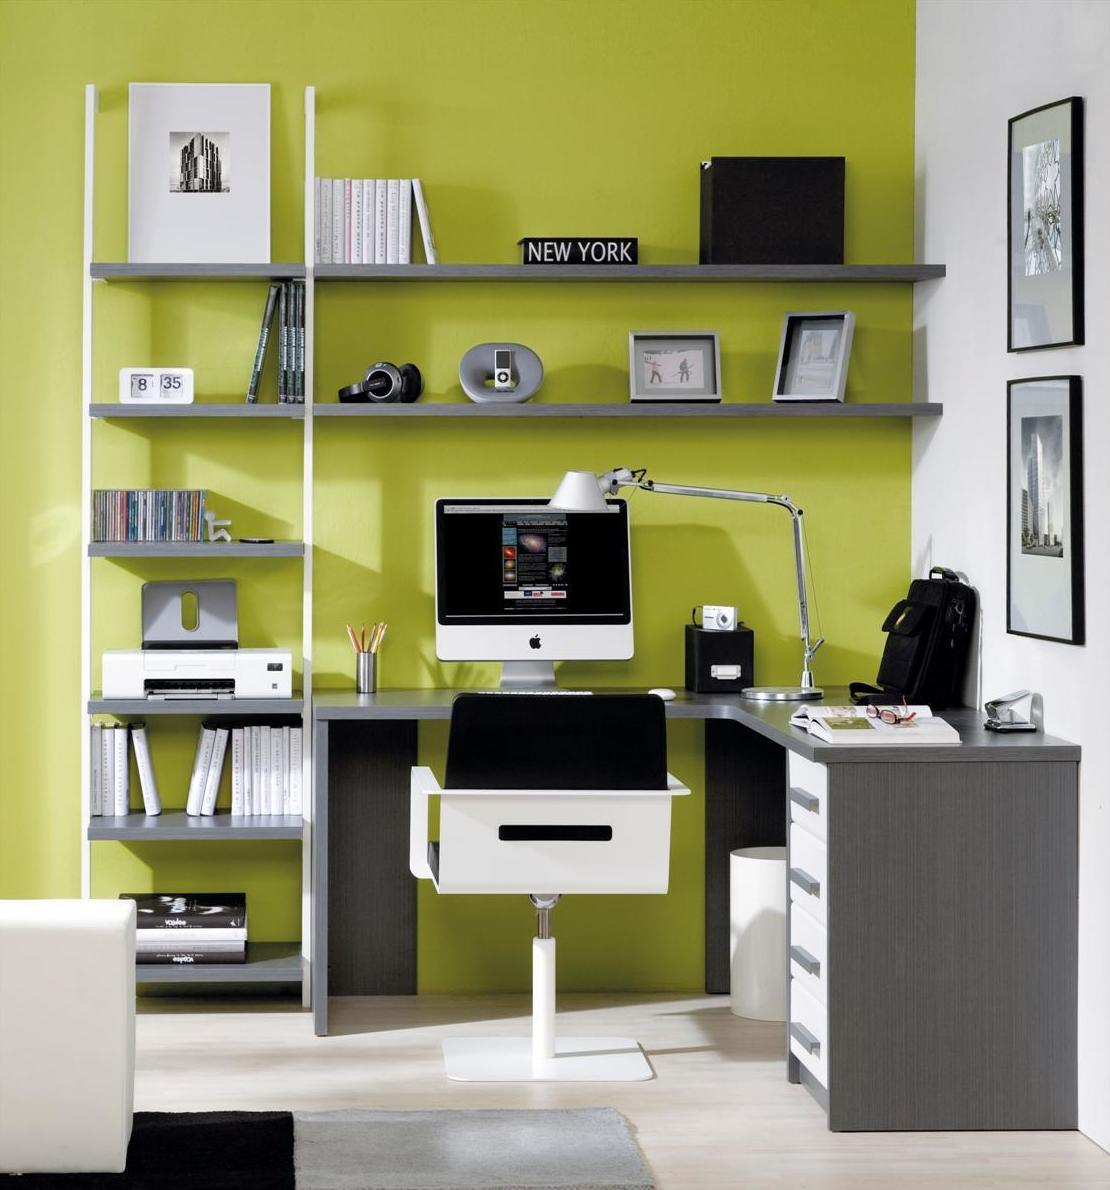 Foto 12 de muebles en m laga k barato muebles - Muebles de salon malaga ...